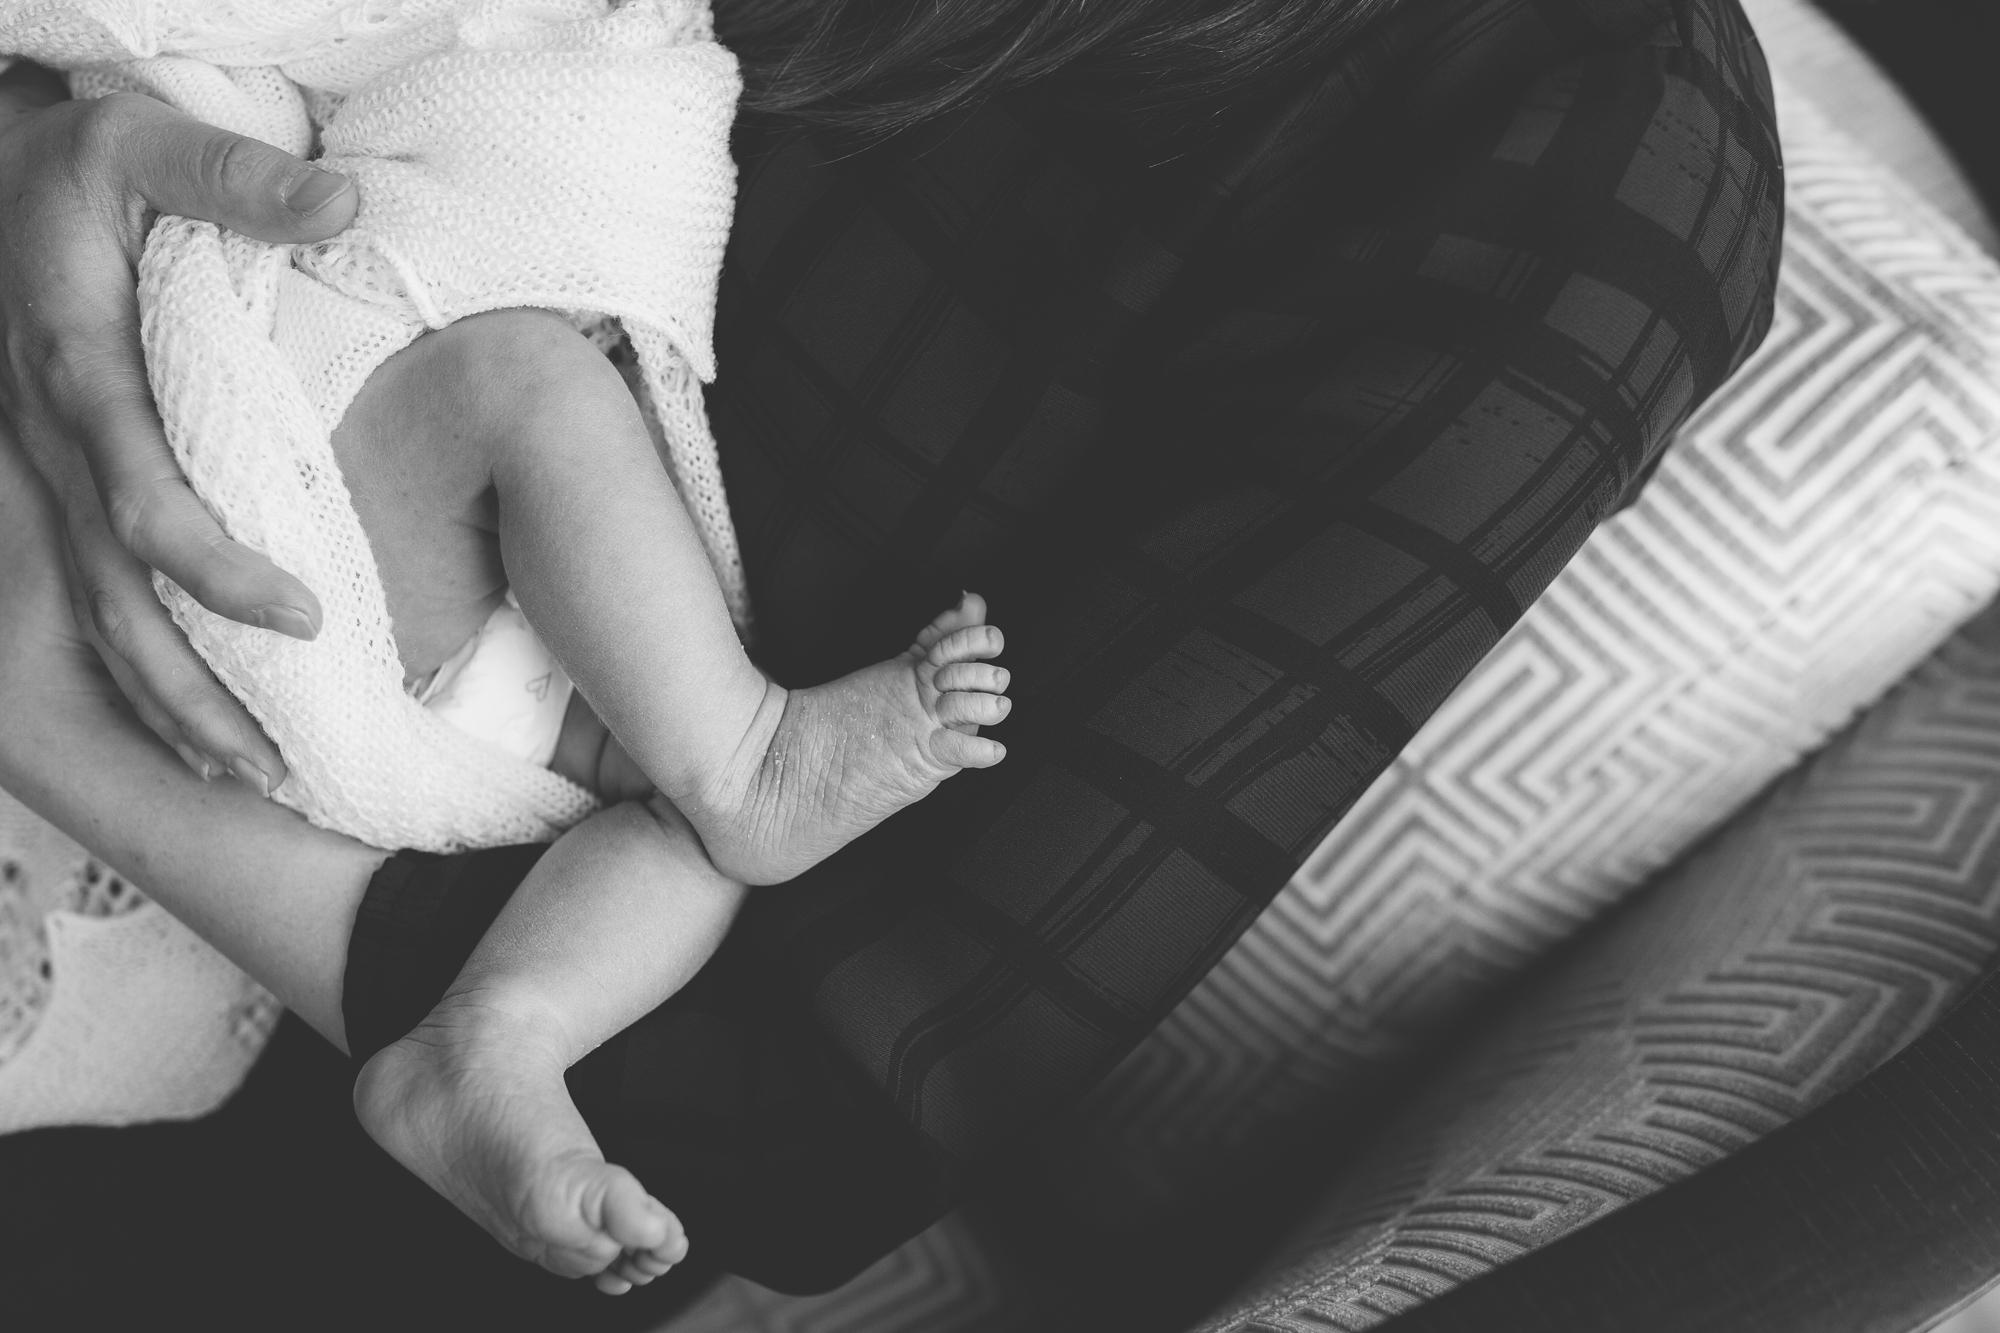 aberdeen newborn photographer, baby photographer Aberdeen, newborn photographer Aberdeenshire